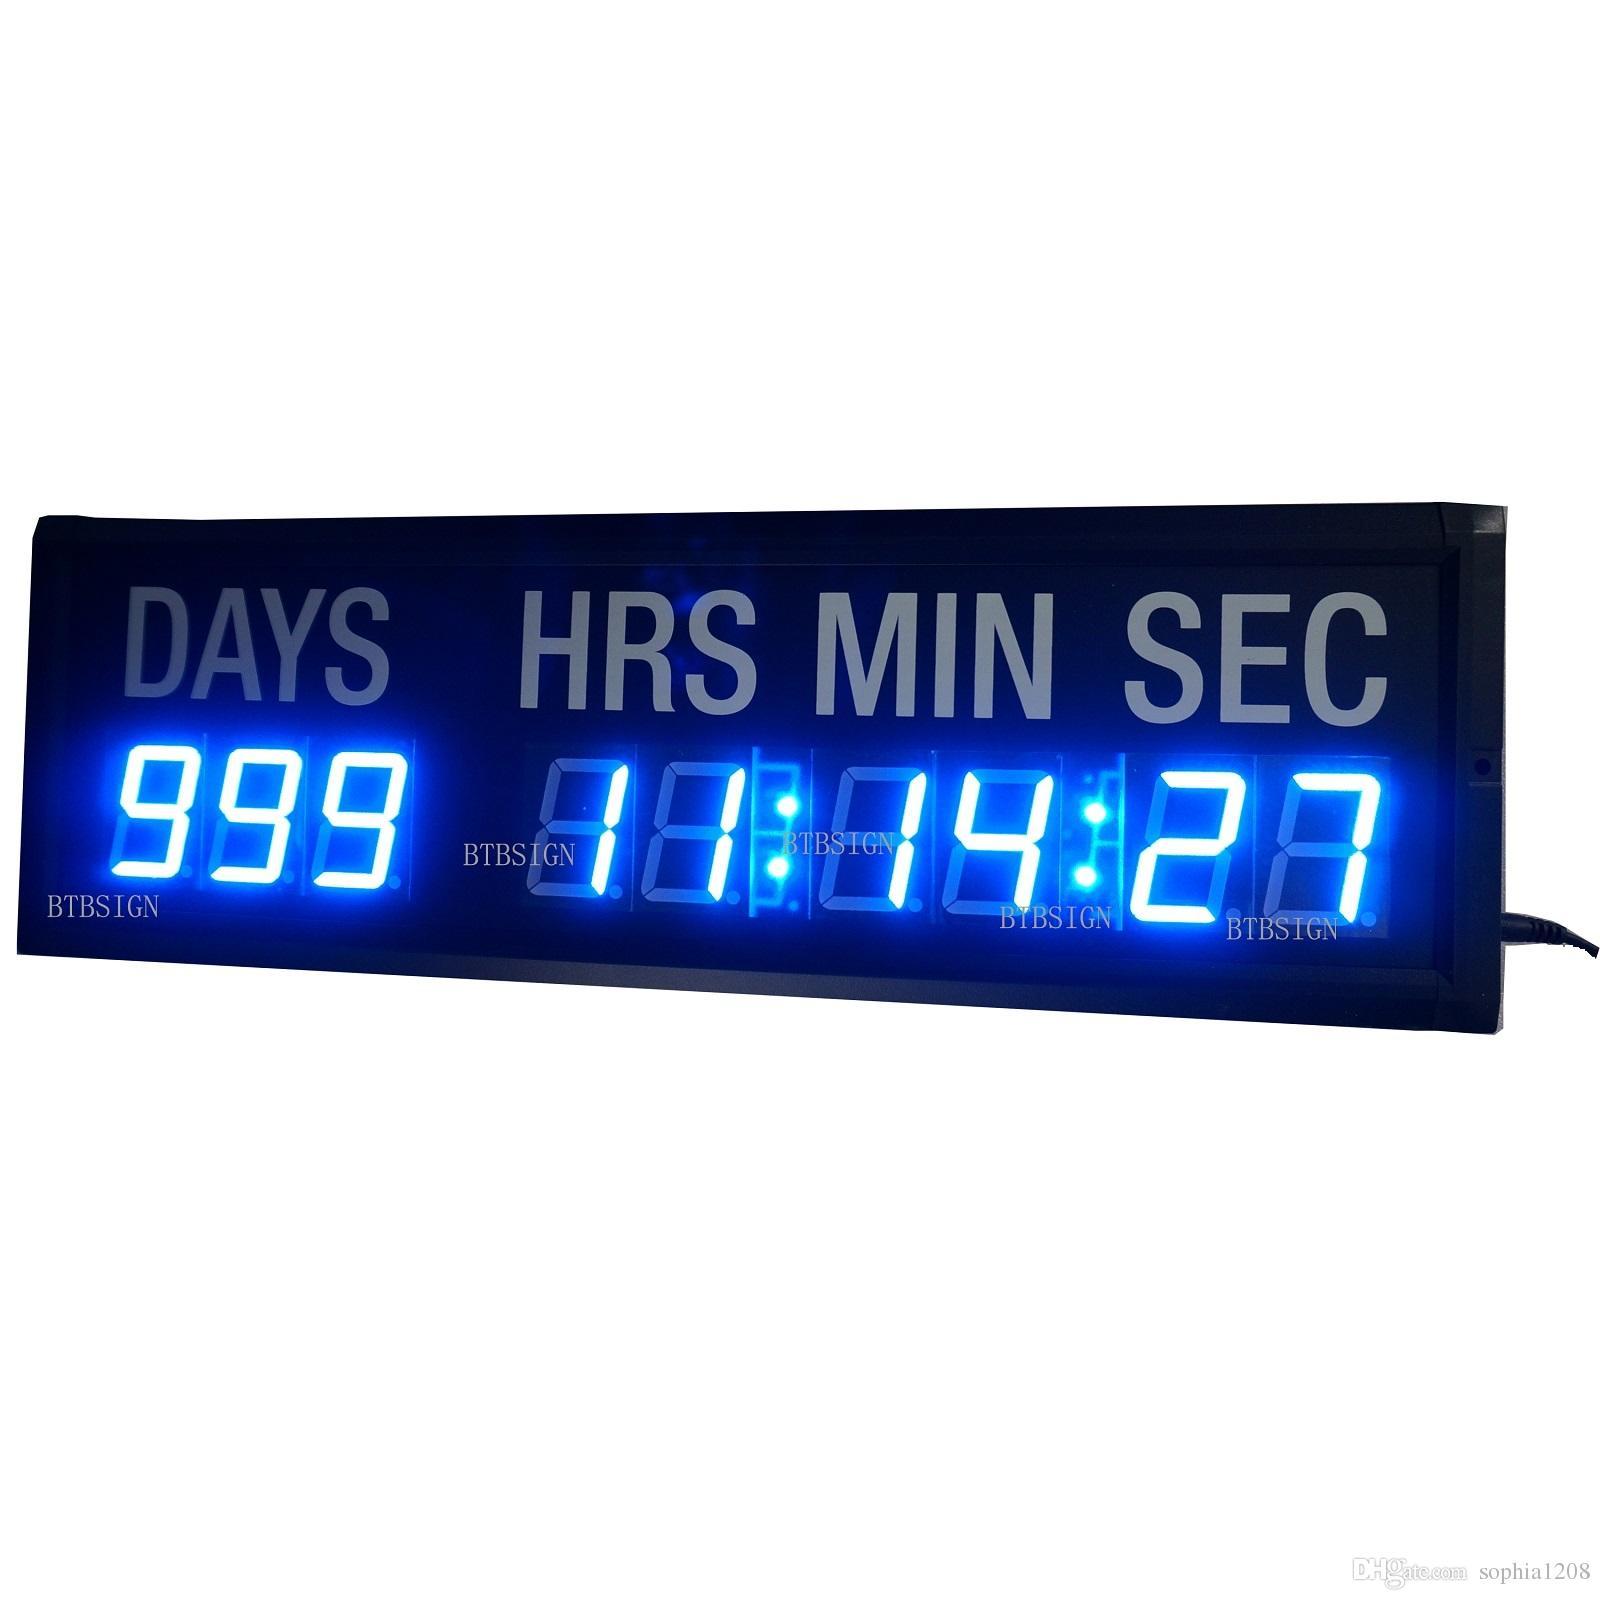 led laufband blaue led countdown uhr in tagen stunden minuten sekunden alle 24 stunden. Black Bedroom Furniture Sets. Home Design Ideas